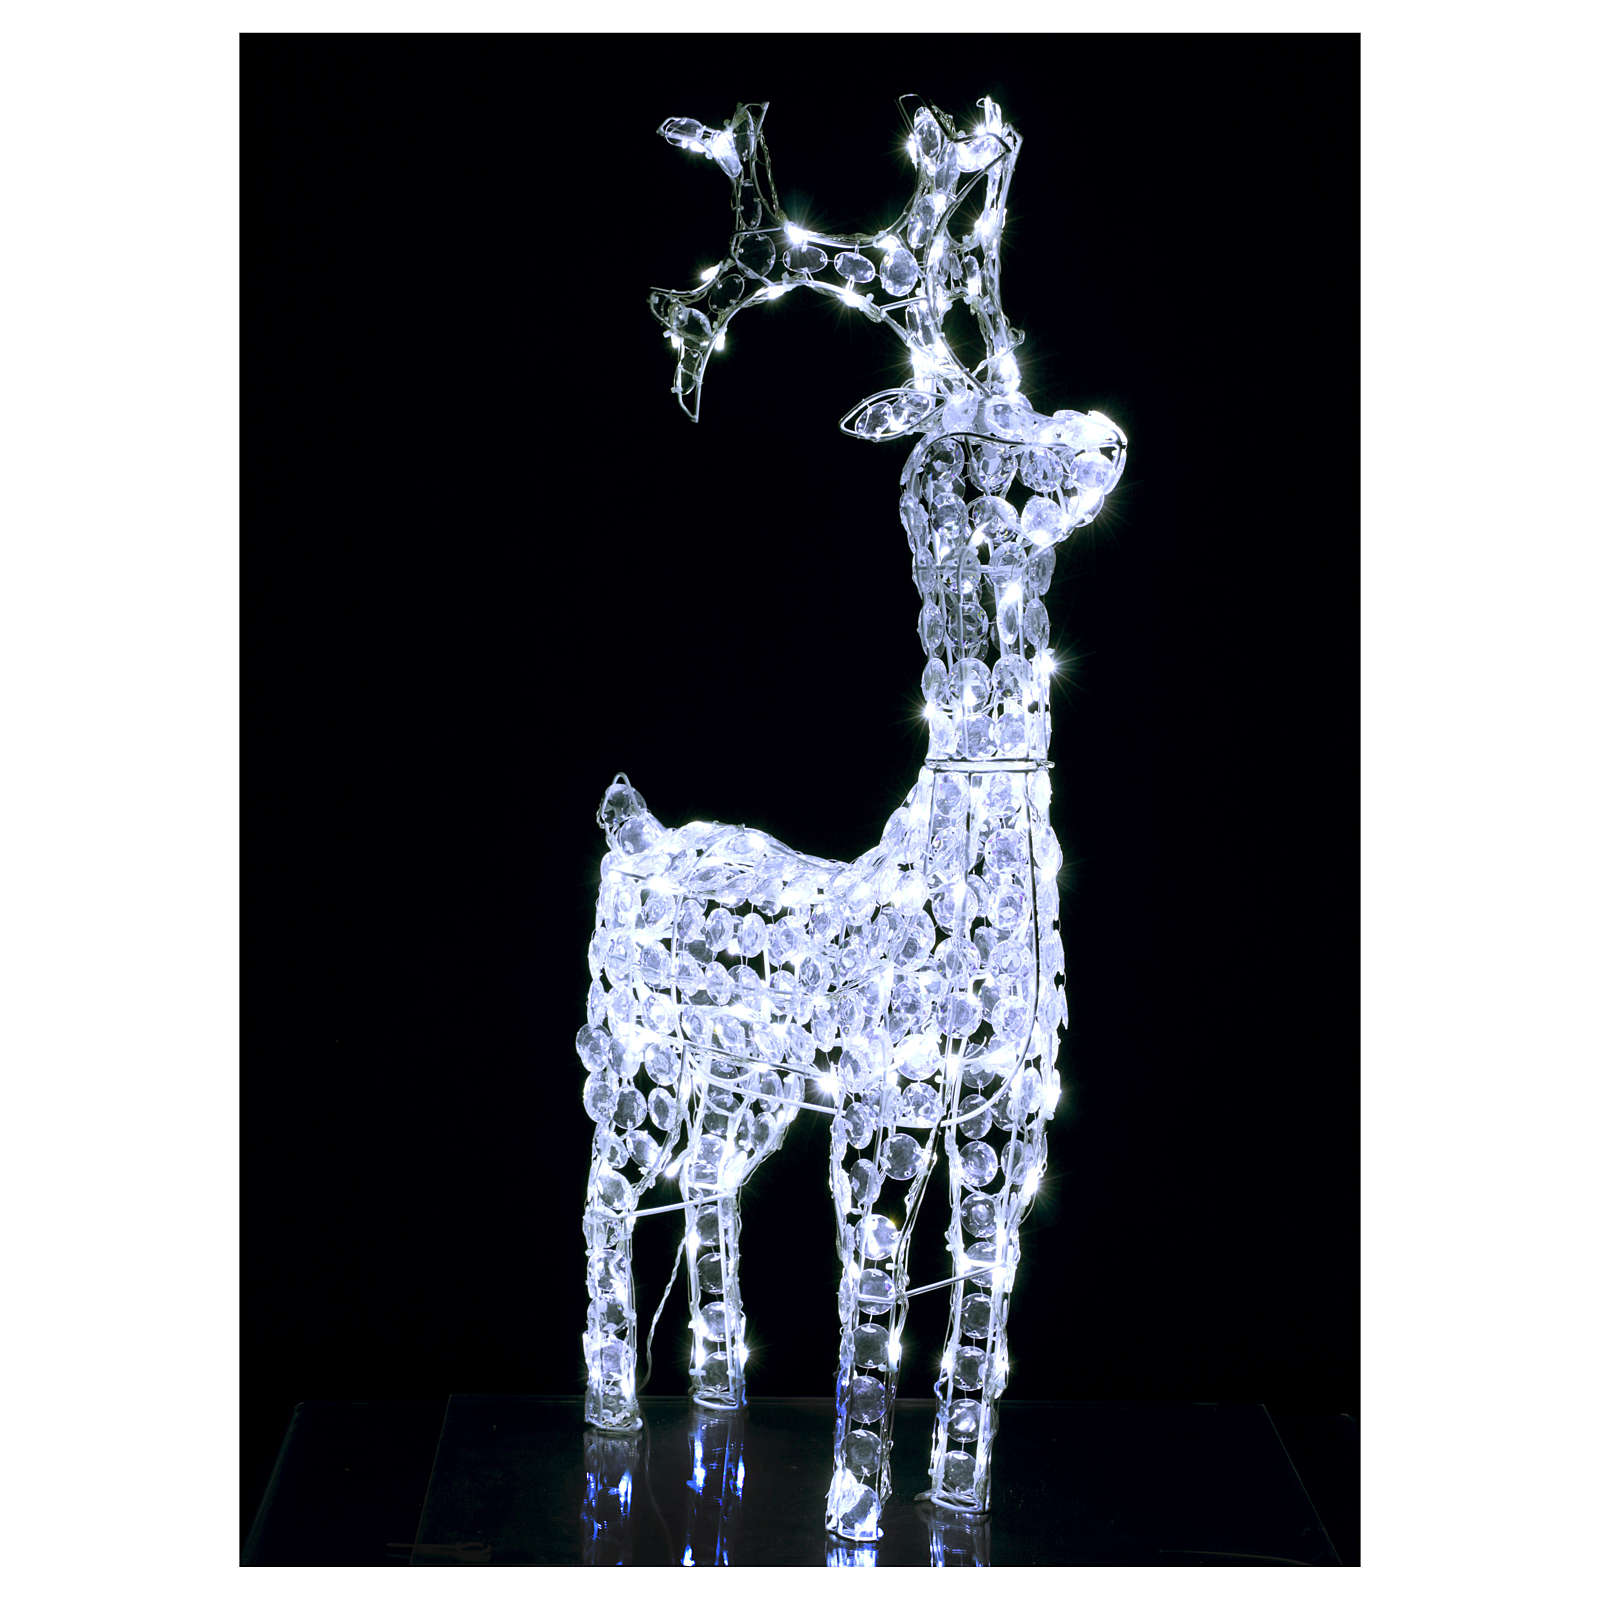 Reno diamantes 150 led blanco frío interno externo 3